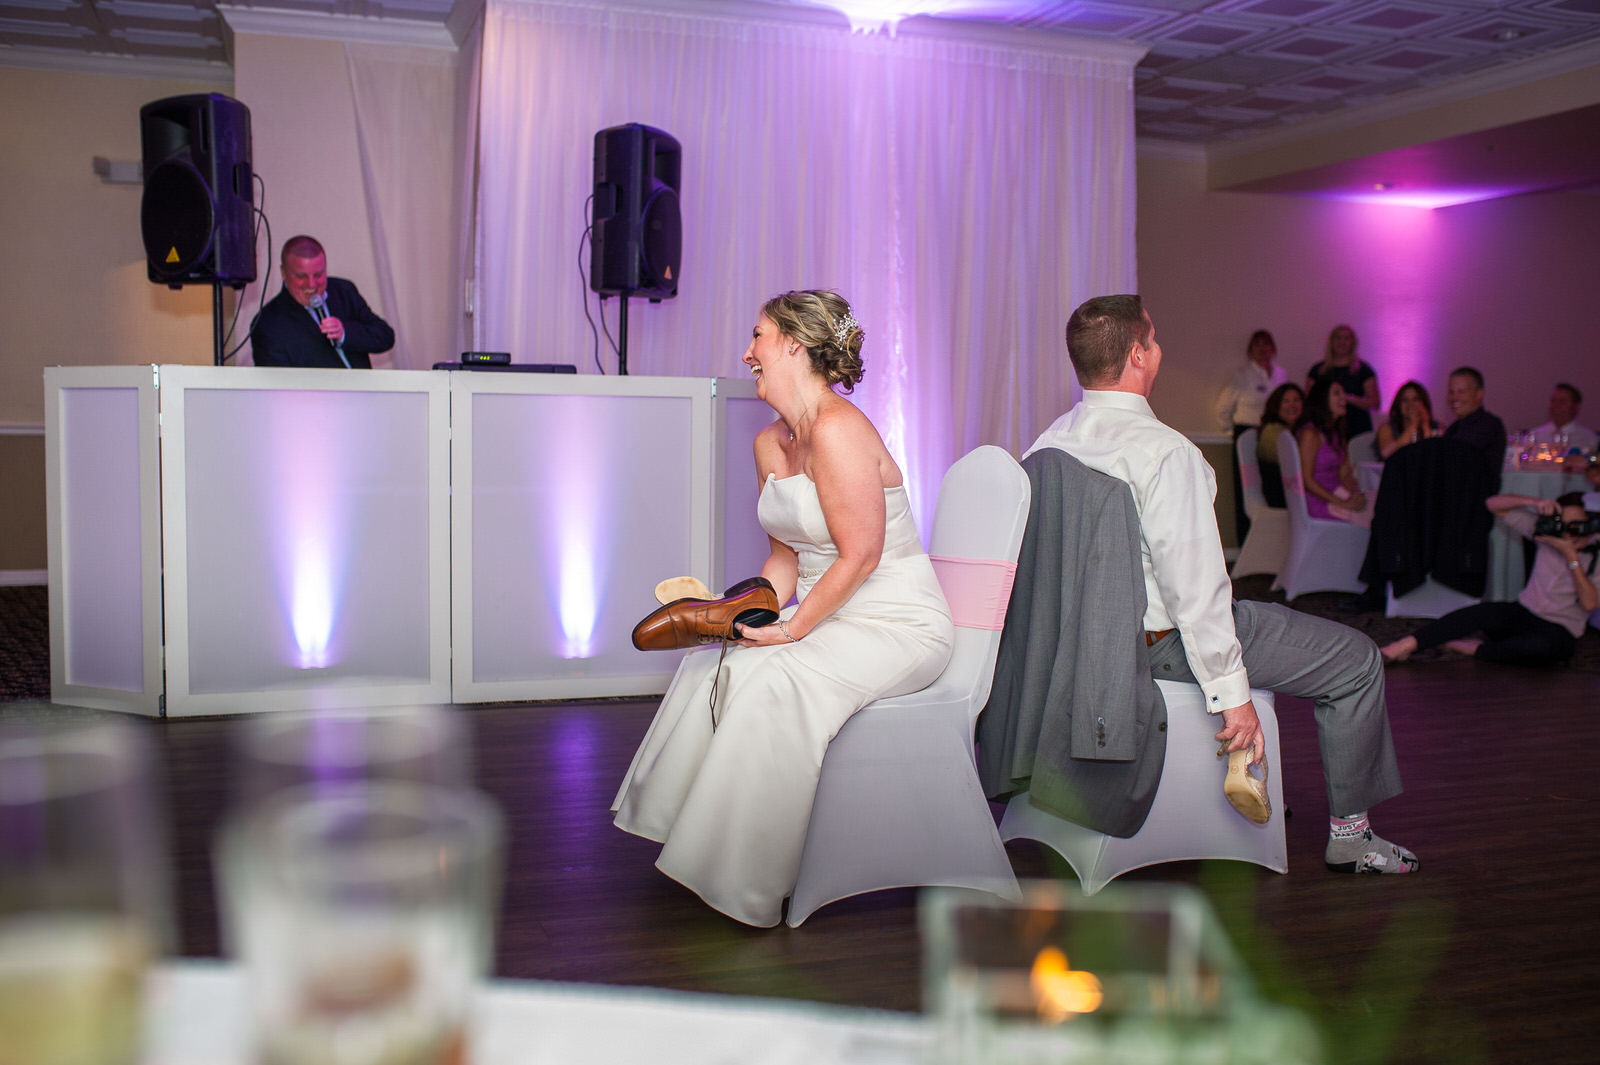 Mike_&_Barbaras_Wedding_3_24_2018-311.jpg